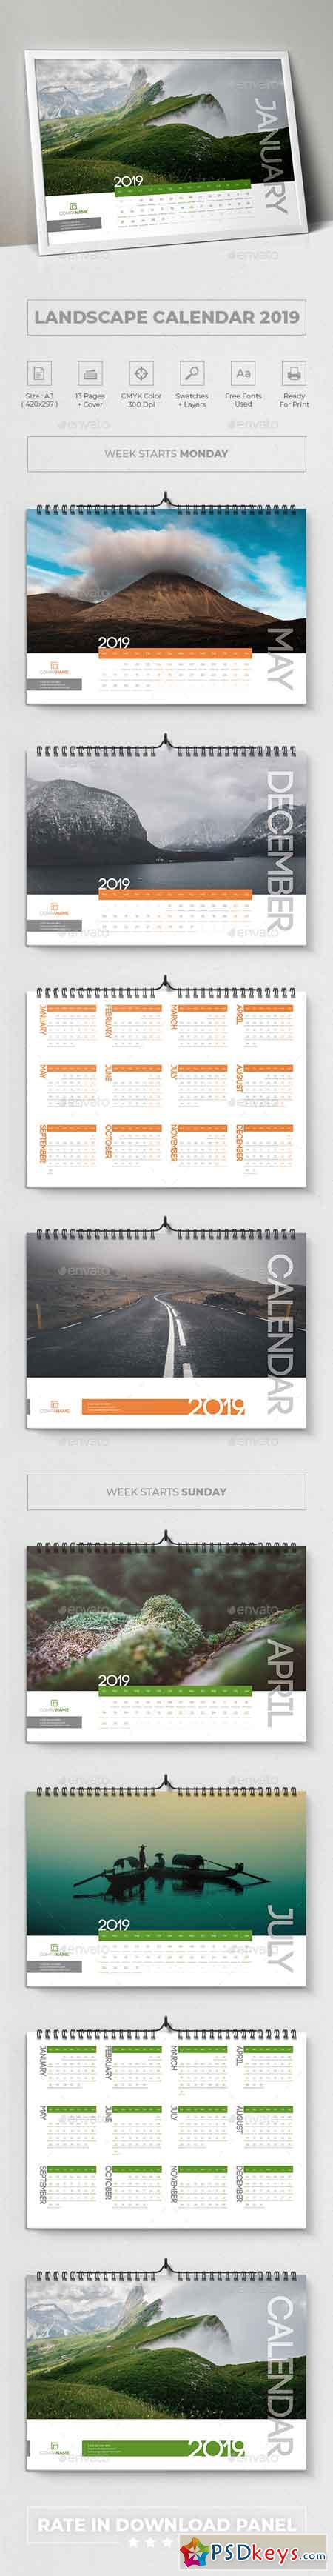 Landscape Calendar 2019 22783301